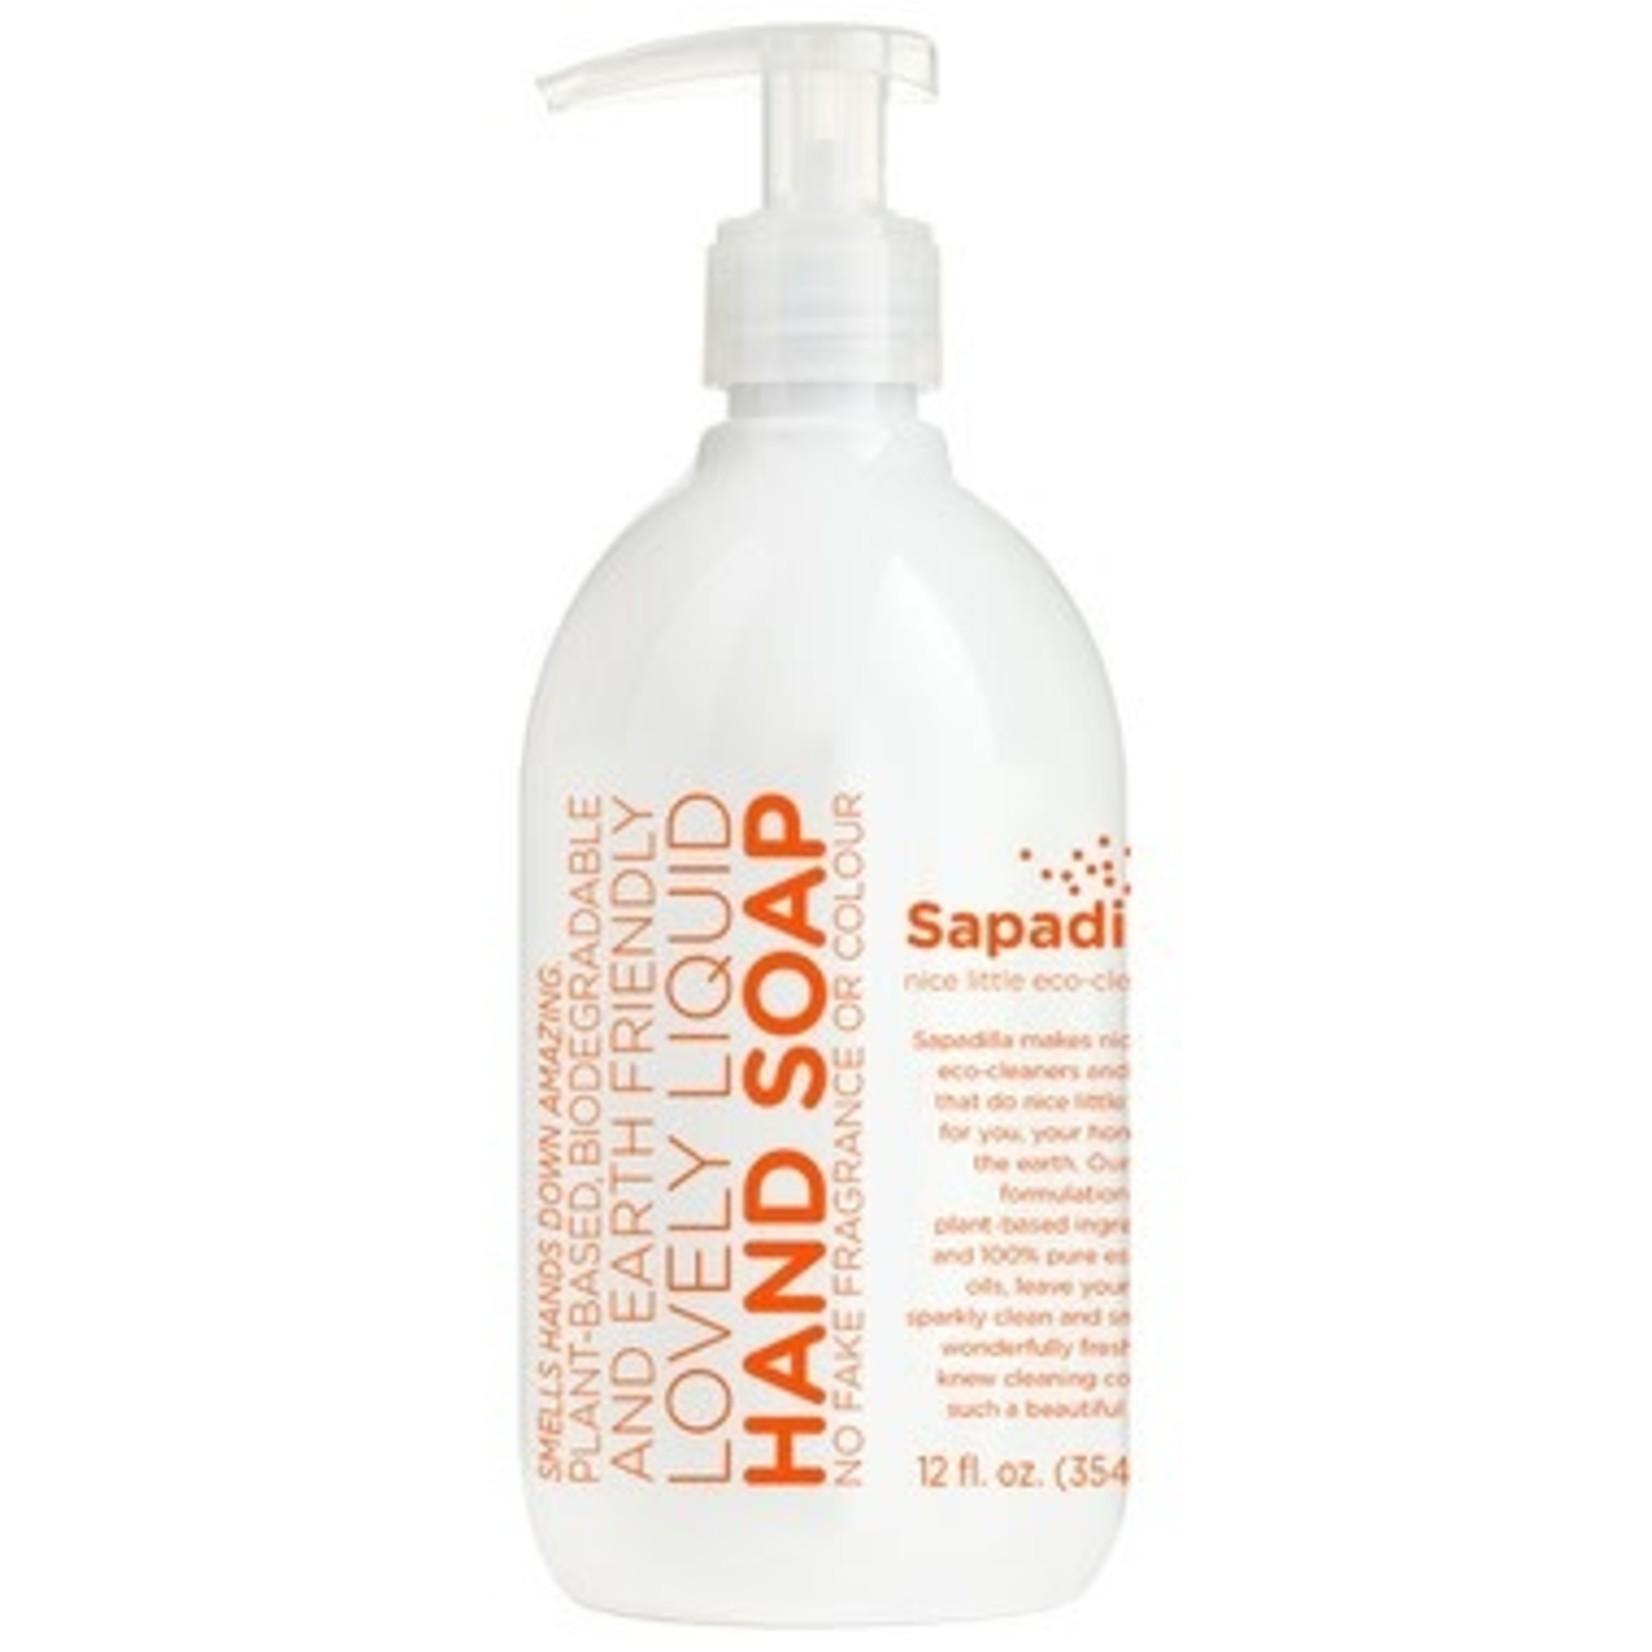 SAPADILLA Grapefruit + Bergamot Hand Soap